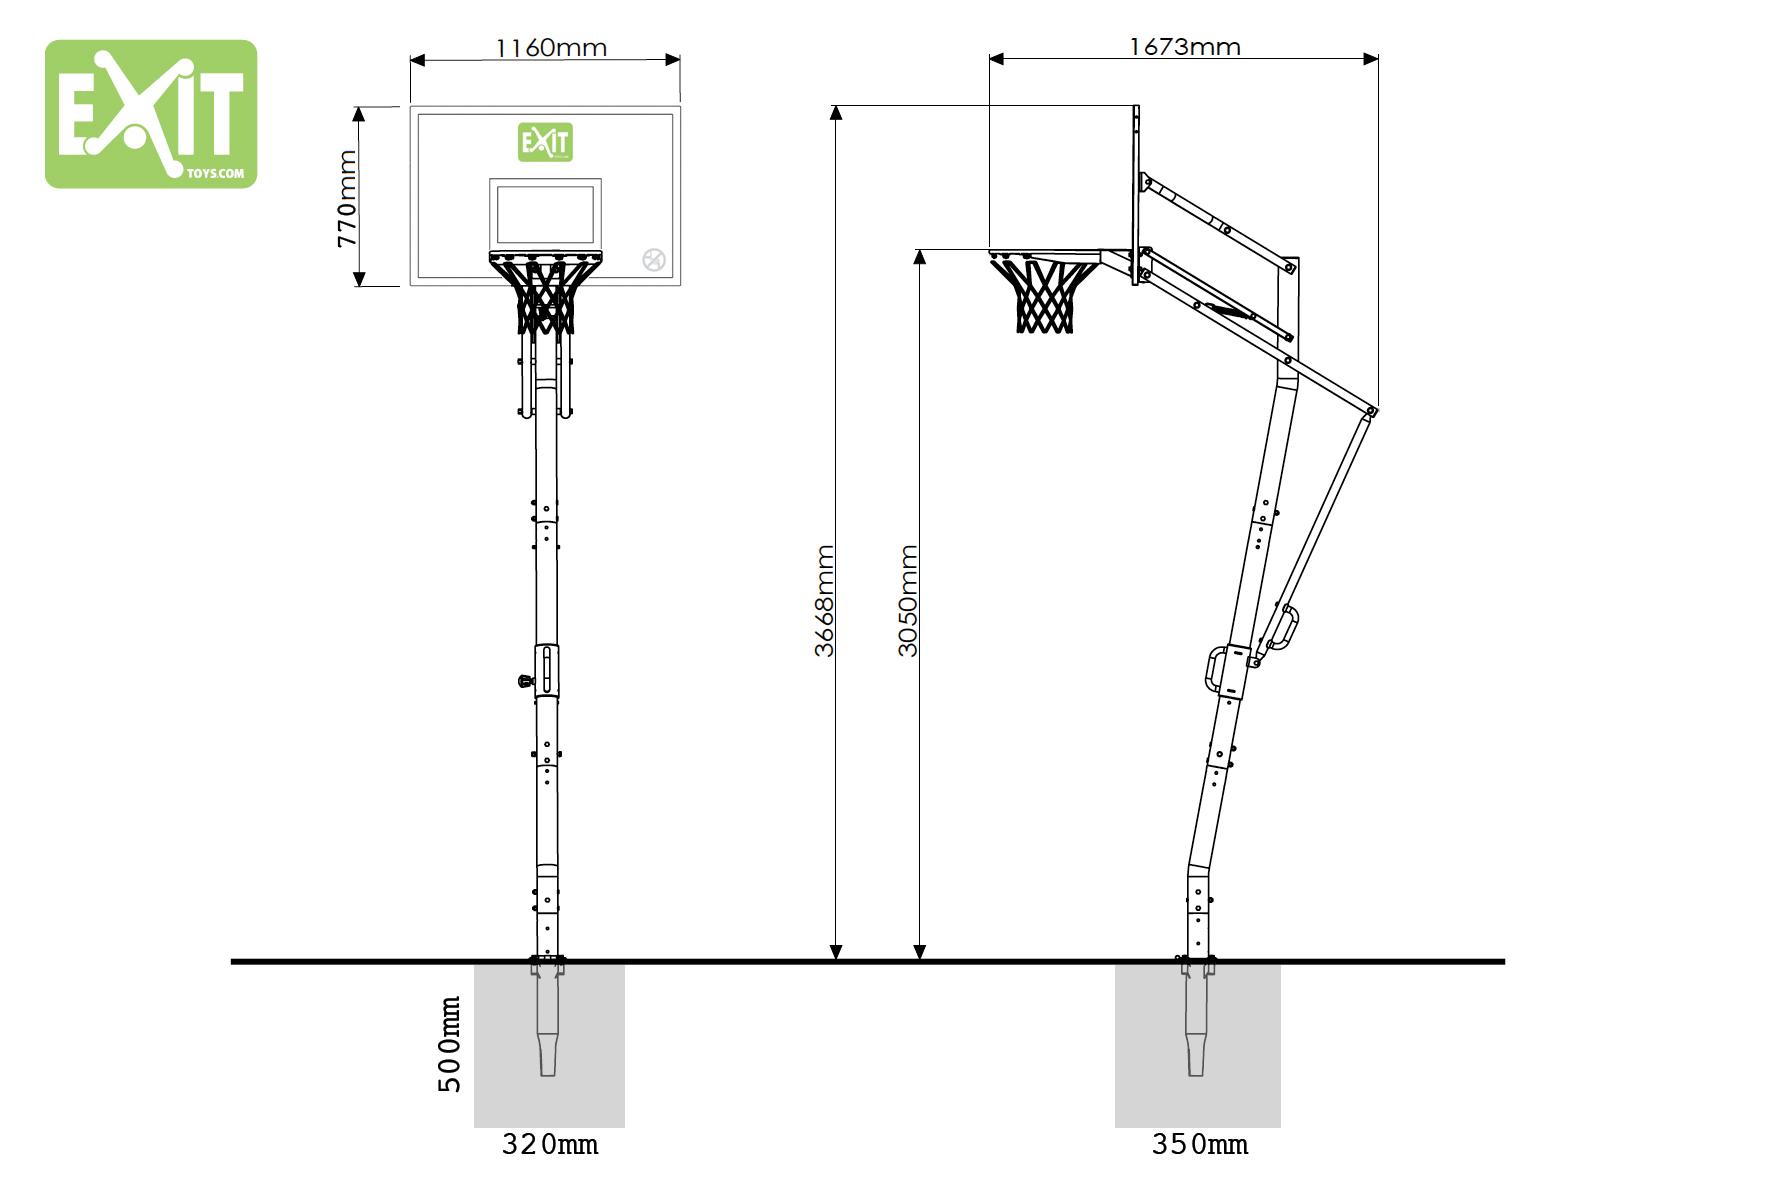 EXIT basketkorg Galaxy InGround nedgrävbar ställning 8001da6b4ea4f